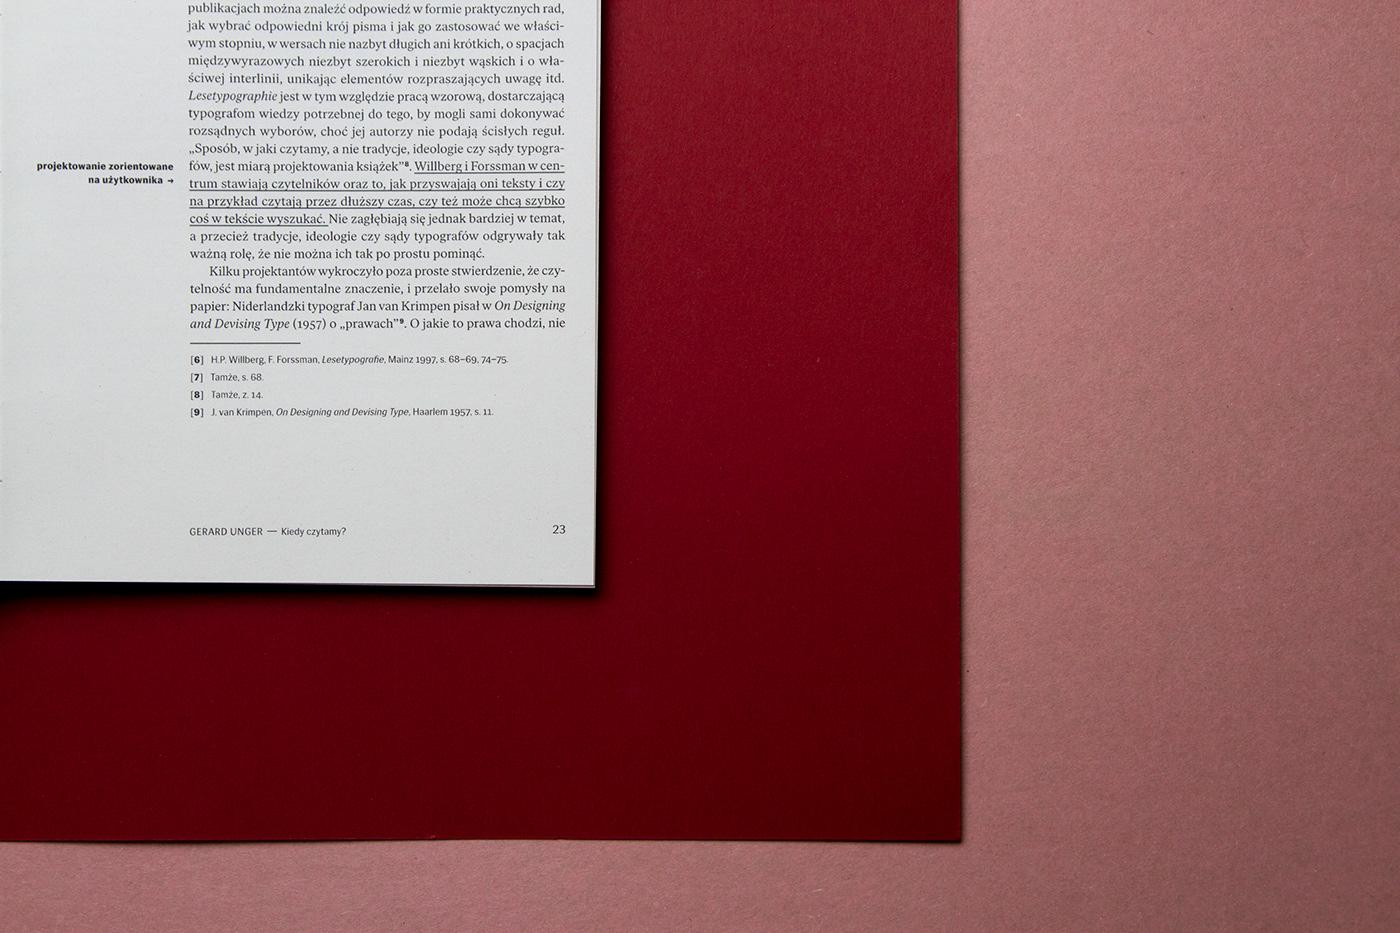 Beatrice Warde typography   legibility gerard unger Hans R. Bosshard Paul Stiff Ewa Repucho ASP w Katowicach Ethics readability